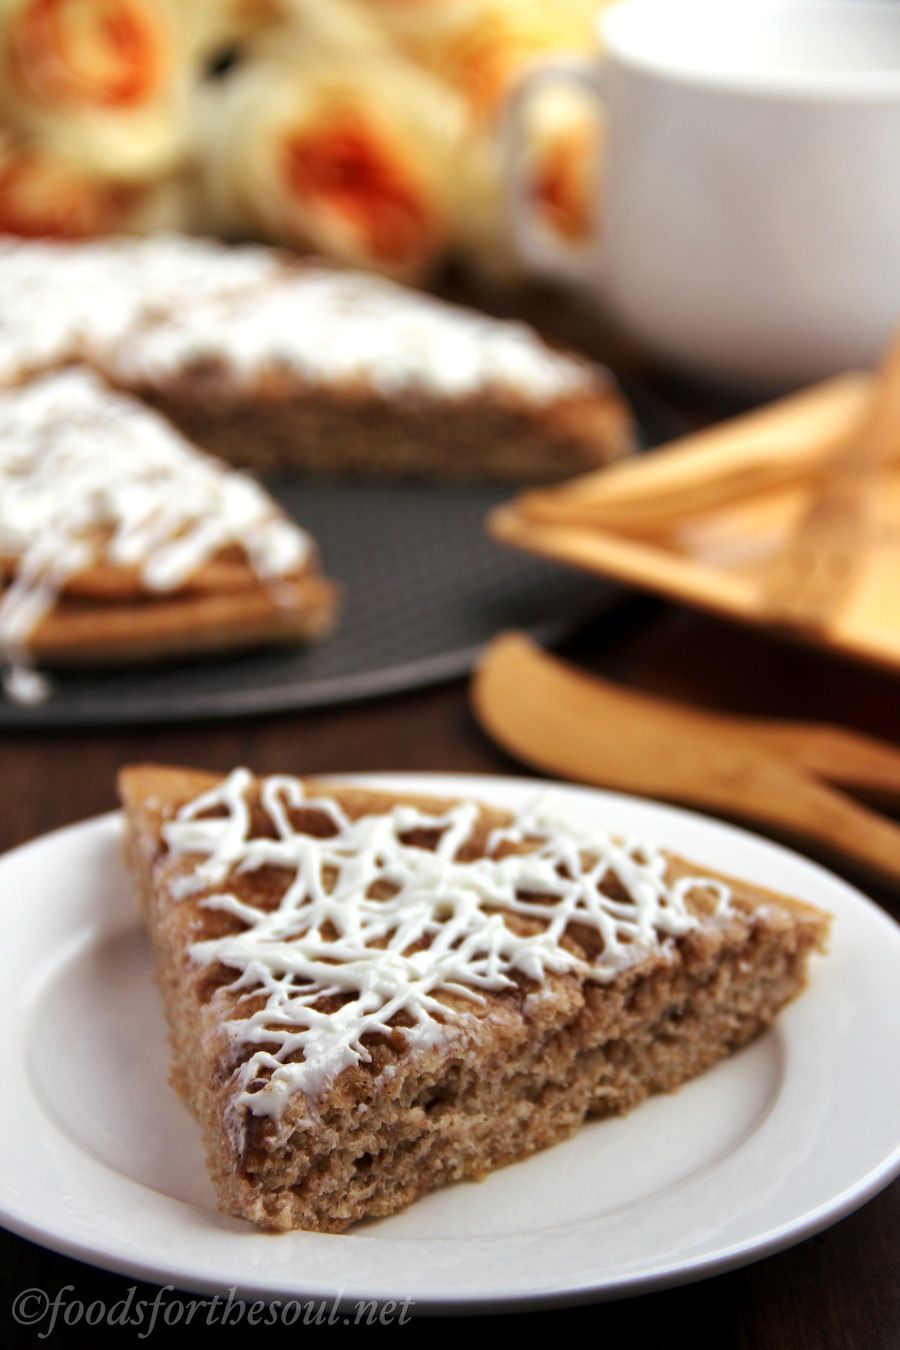 http://amyshealthybaking.com/blog/2013/06/02/cinnamon-roll-pizza/